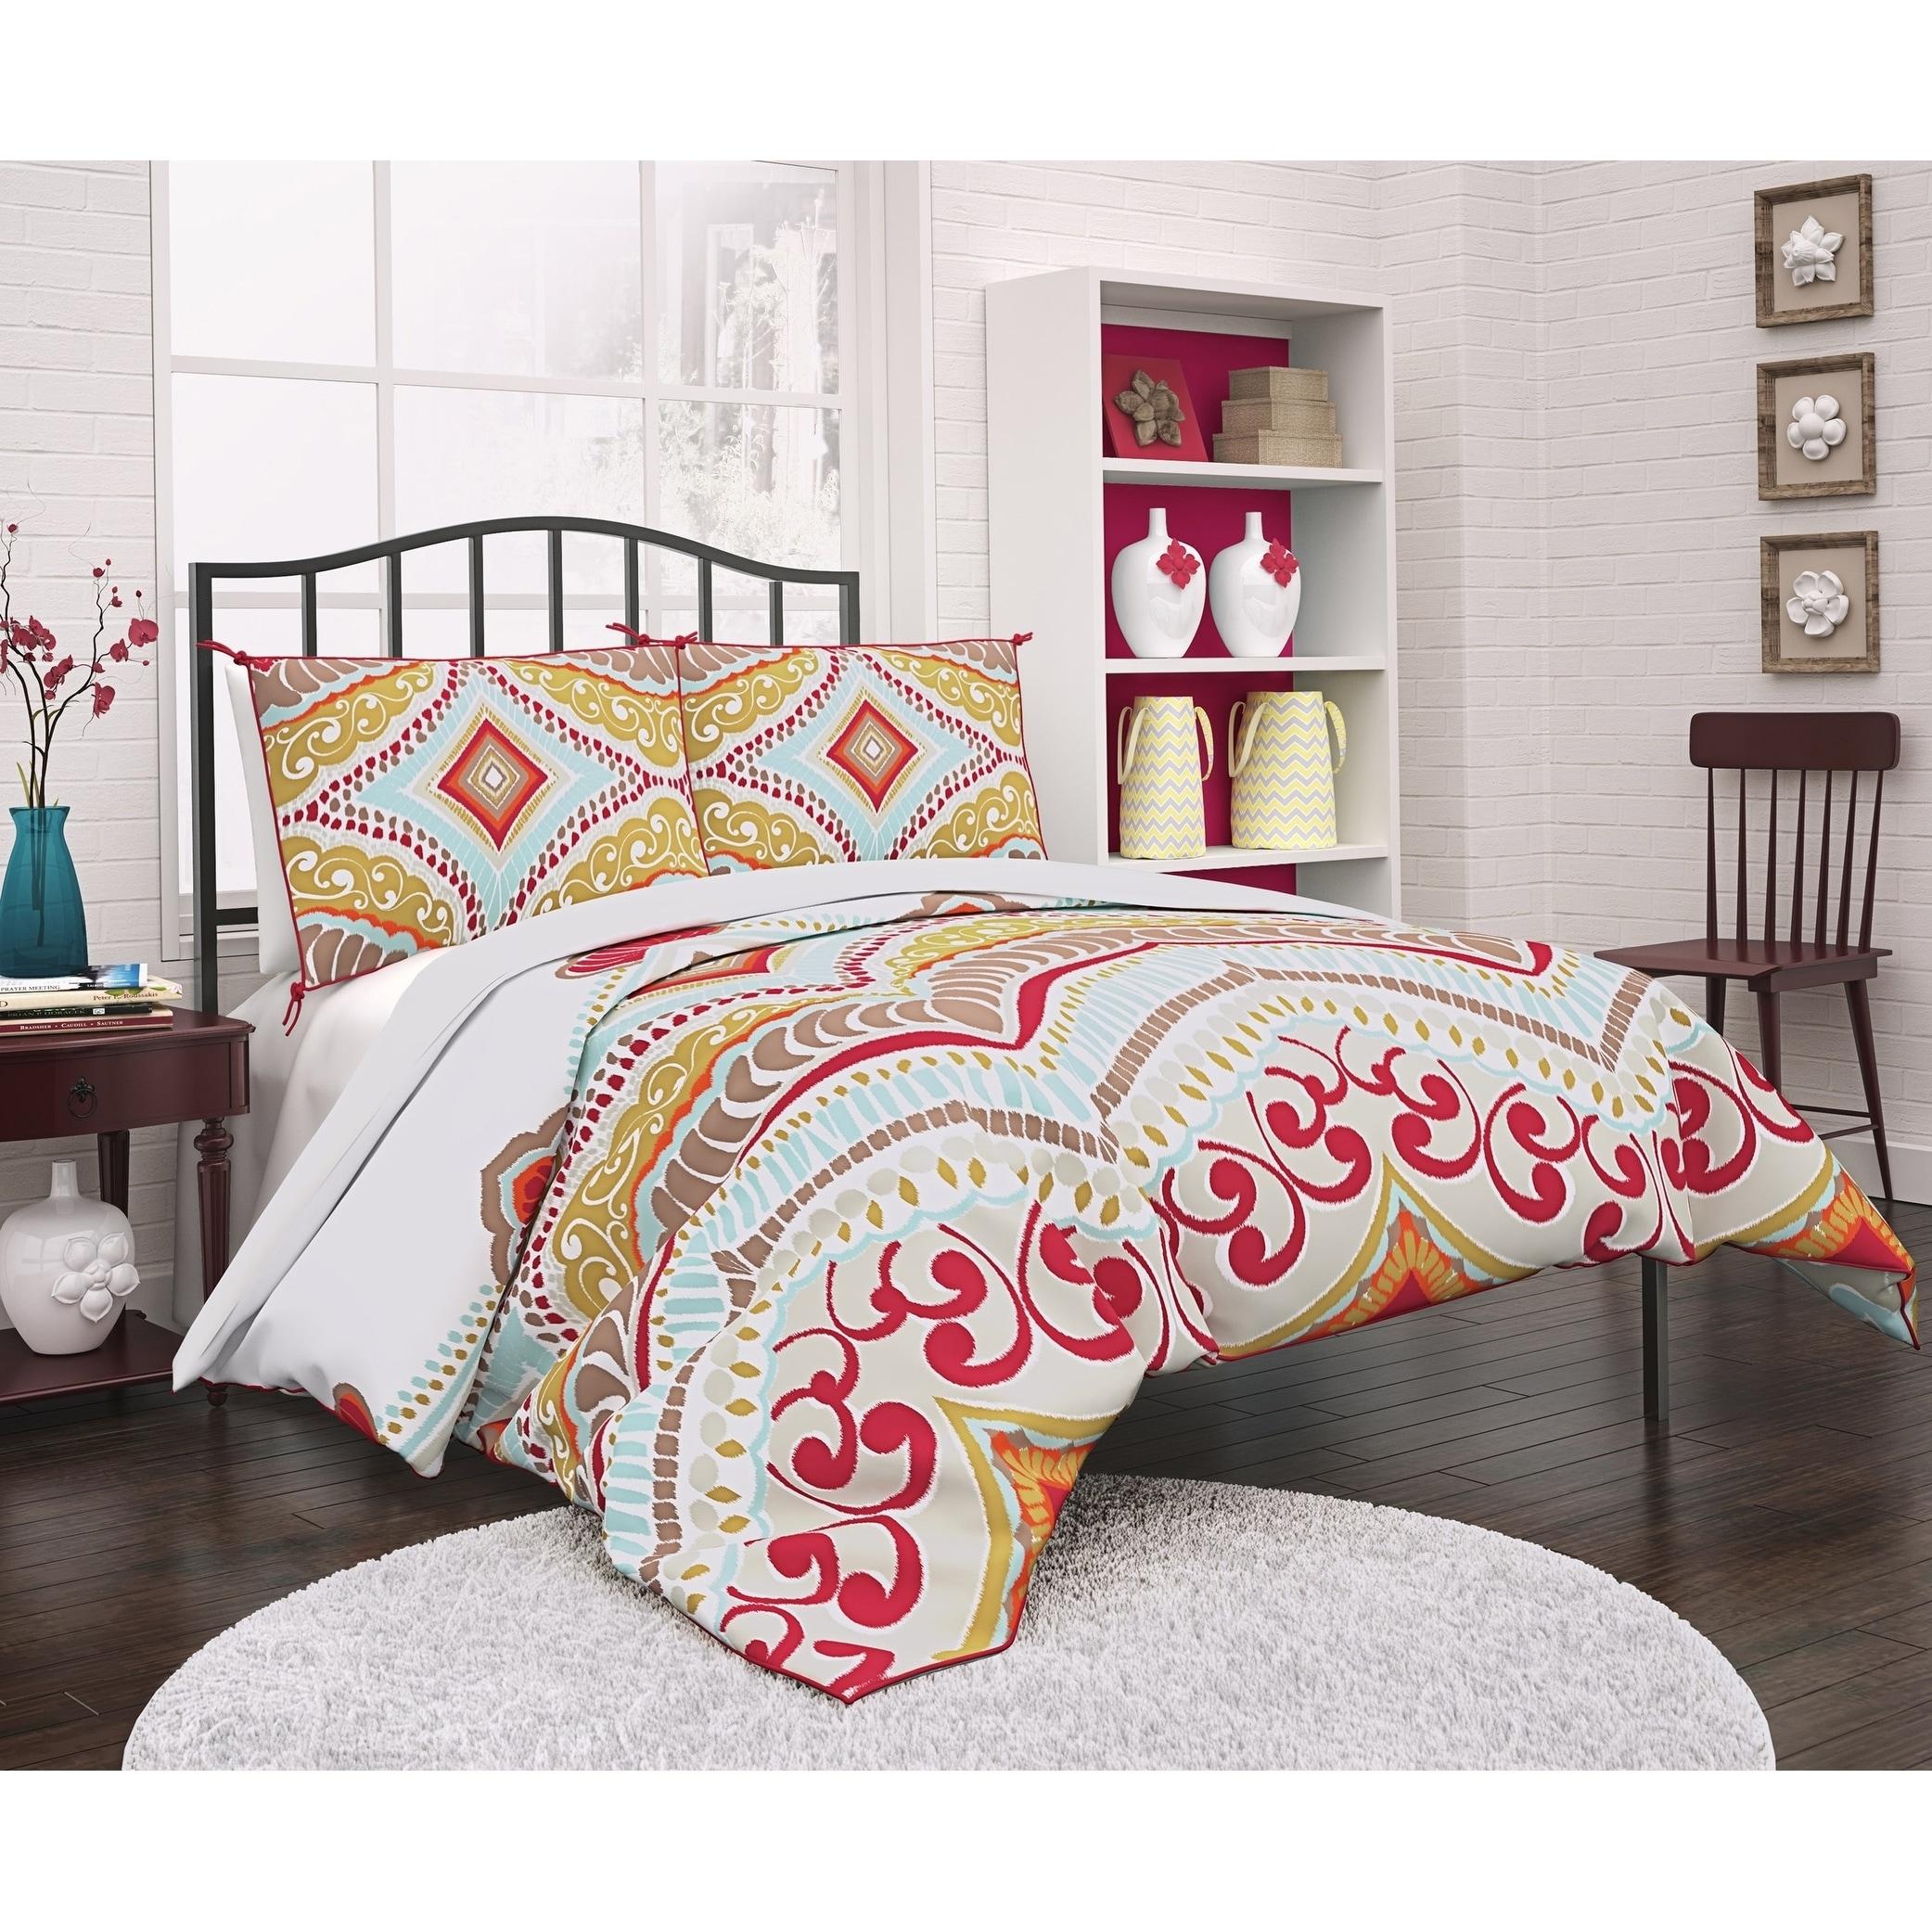 DOPO Boho Boutique Utopia Reversible Comforter Set (Queen...